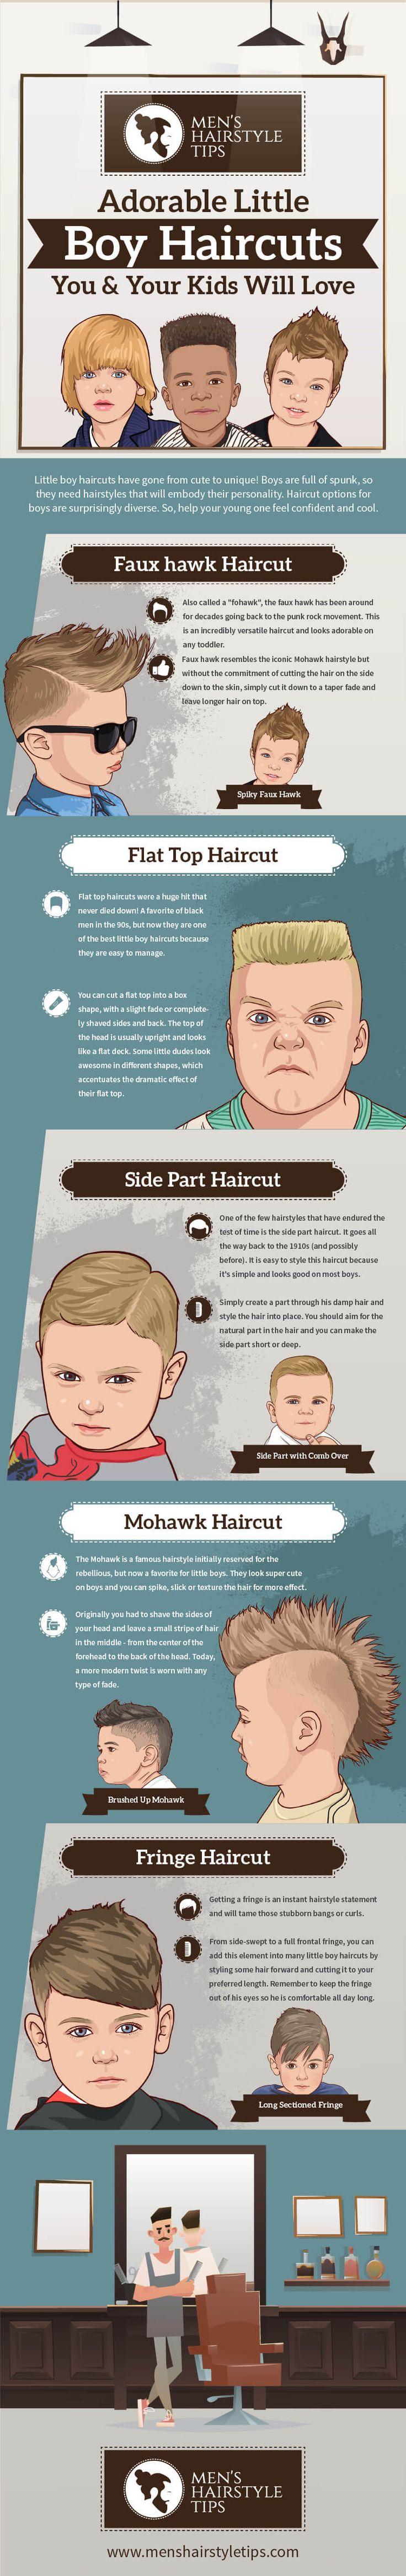 90s boy long hair menus hairstyle tips menshairtips on pinterest